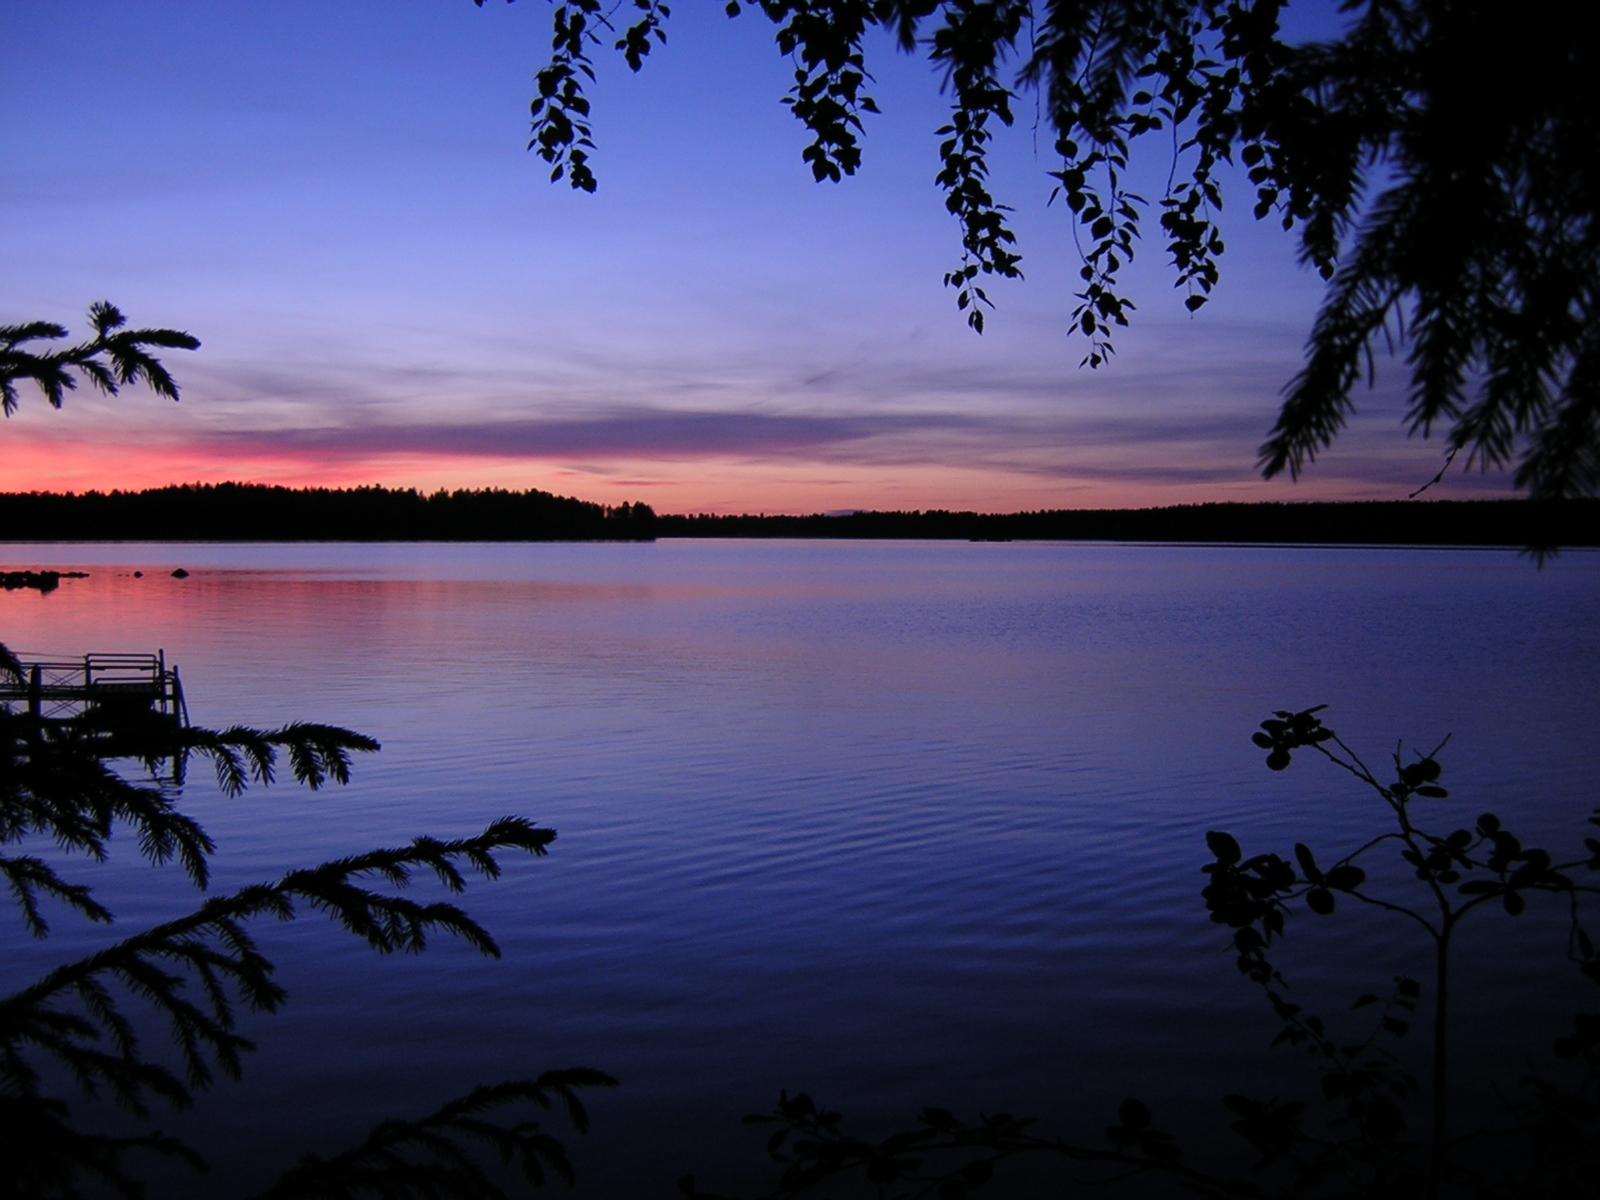 Fall Winter Wallpaper File Lake 196 Ht 228 Rinj 228 Rvi At Summer Night Jpg Wikimedia Commons